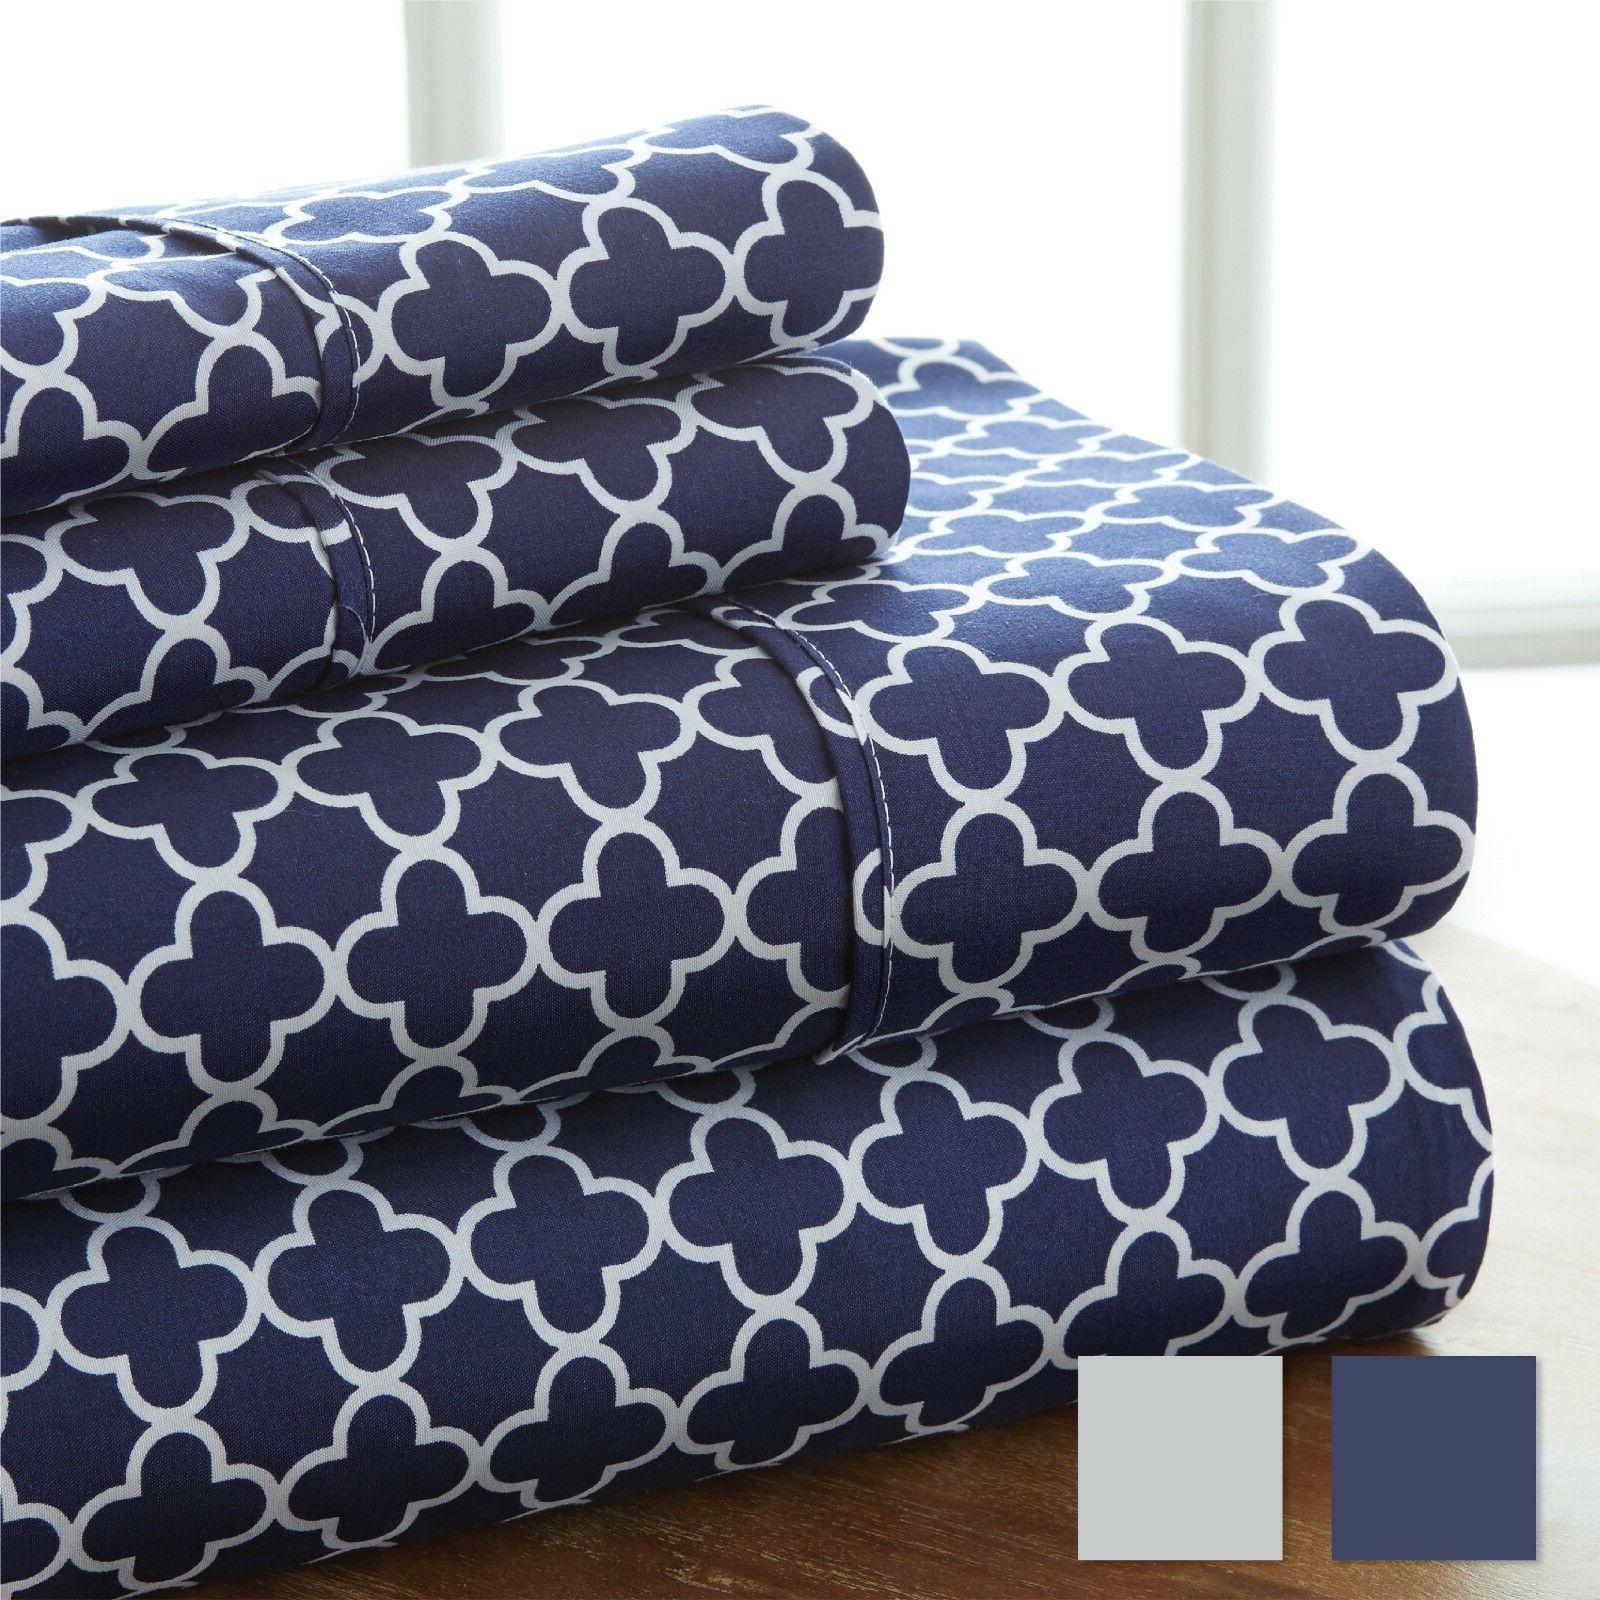 Hotel Collection - 4 Piece Quatrefoil Pattern Bed Sheet Set